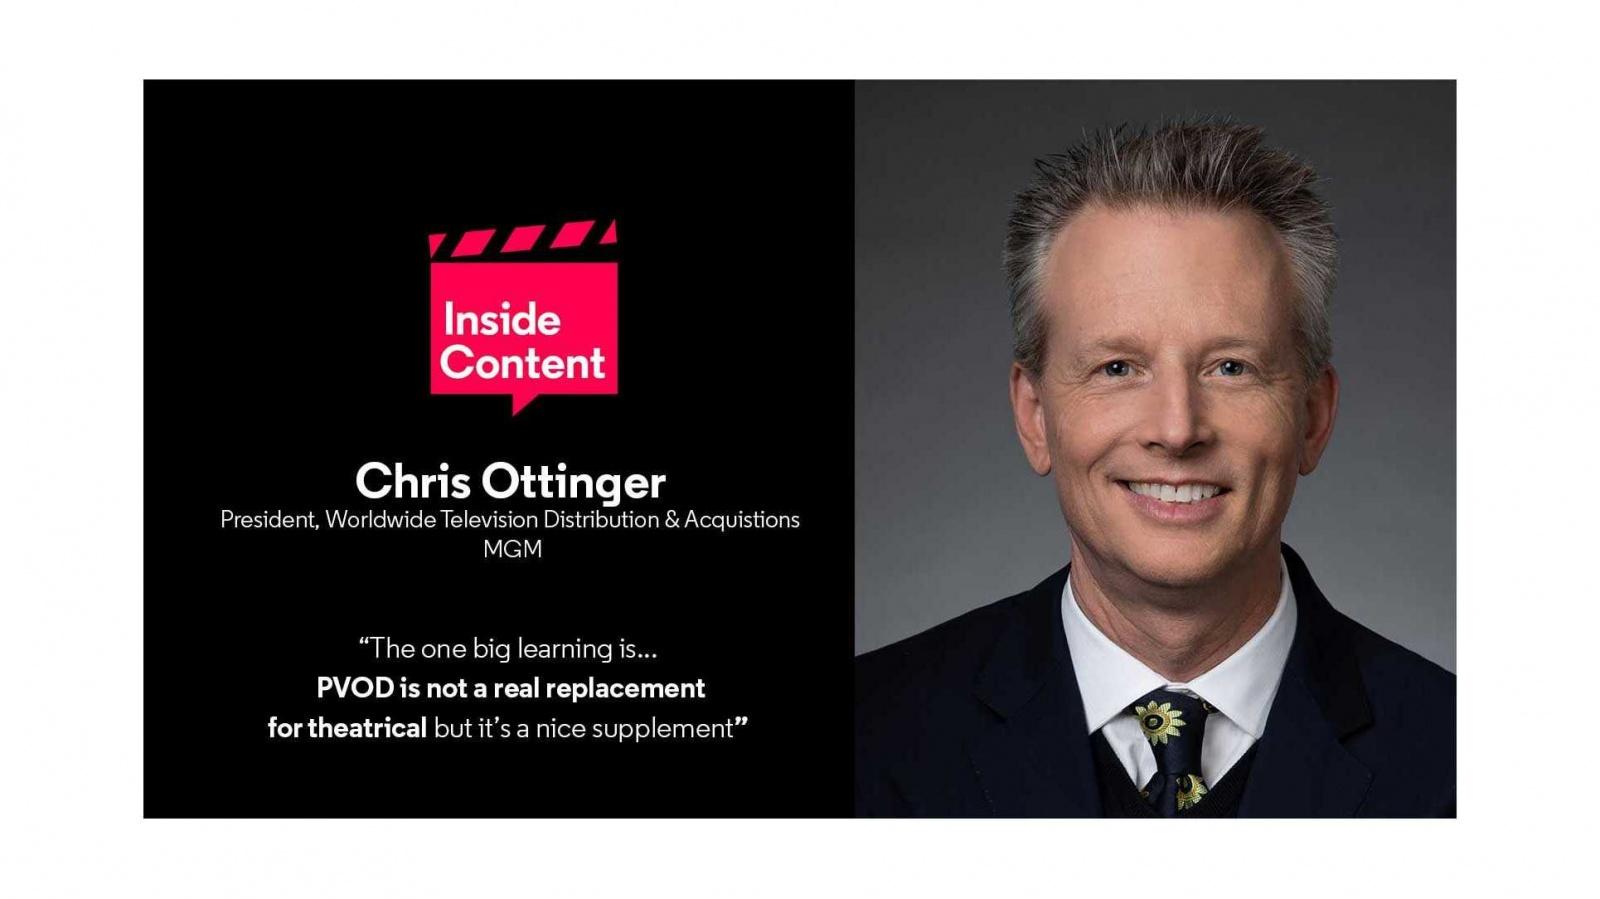 Chris Ottinger quote PVOD